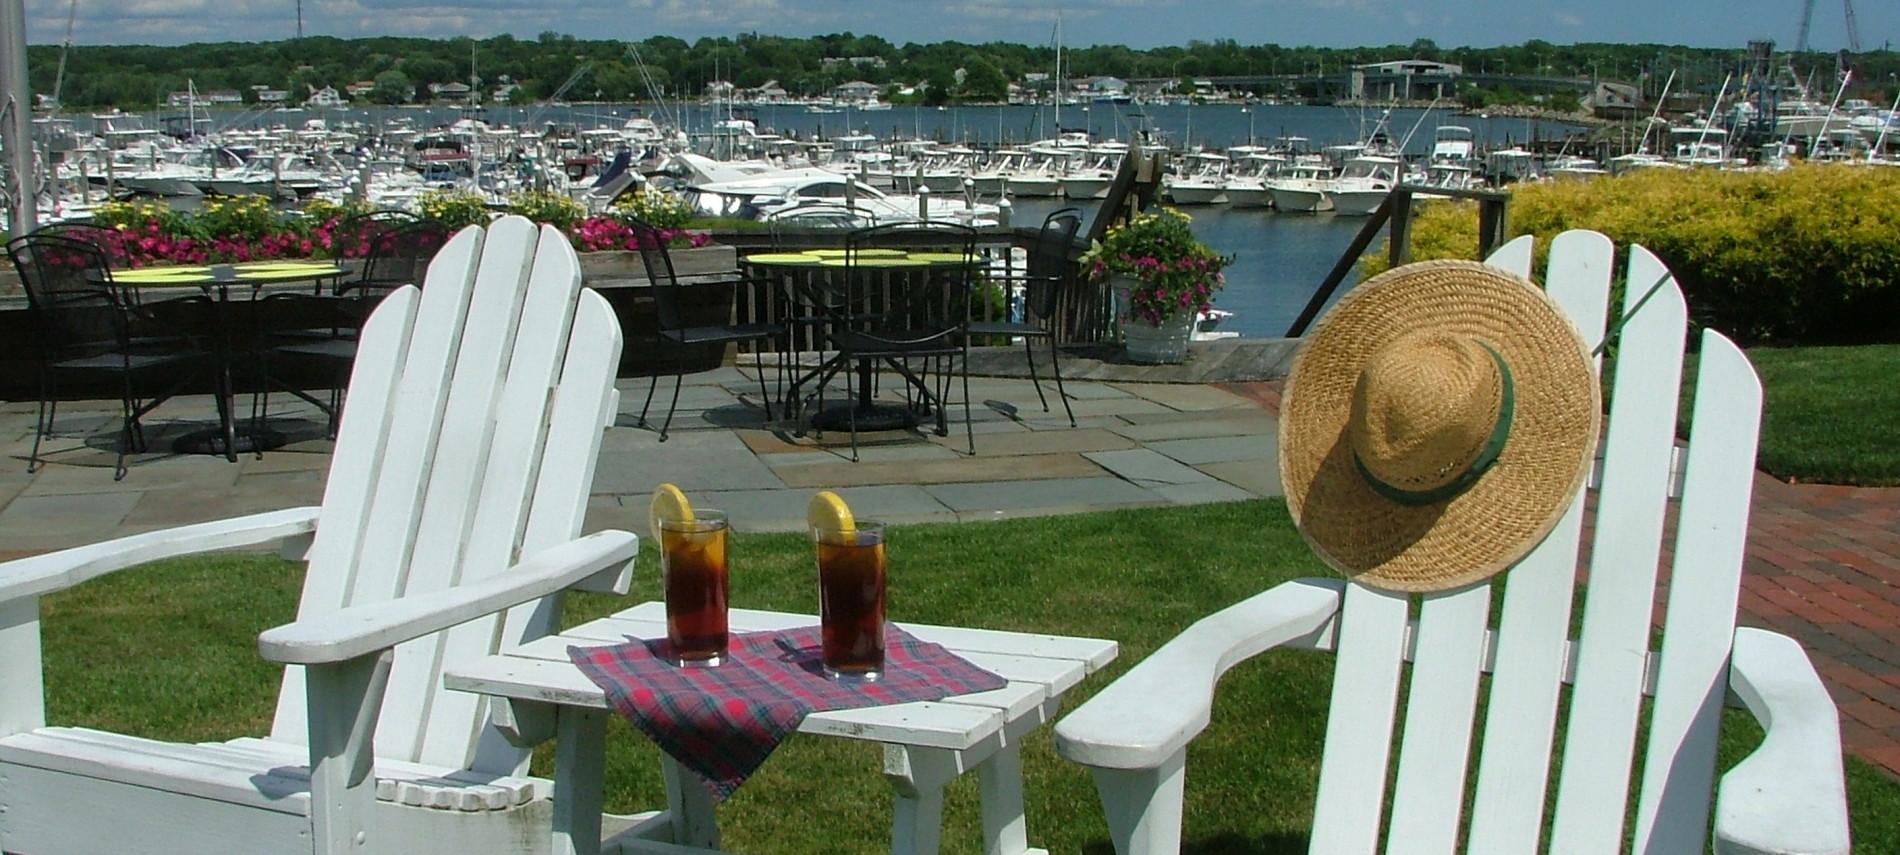 Inn at Harbor Hill Marina chairs